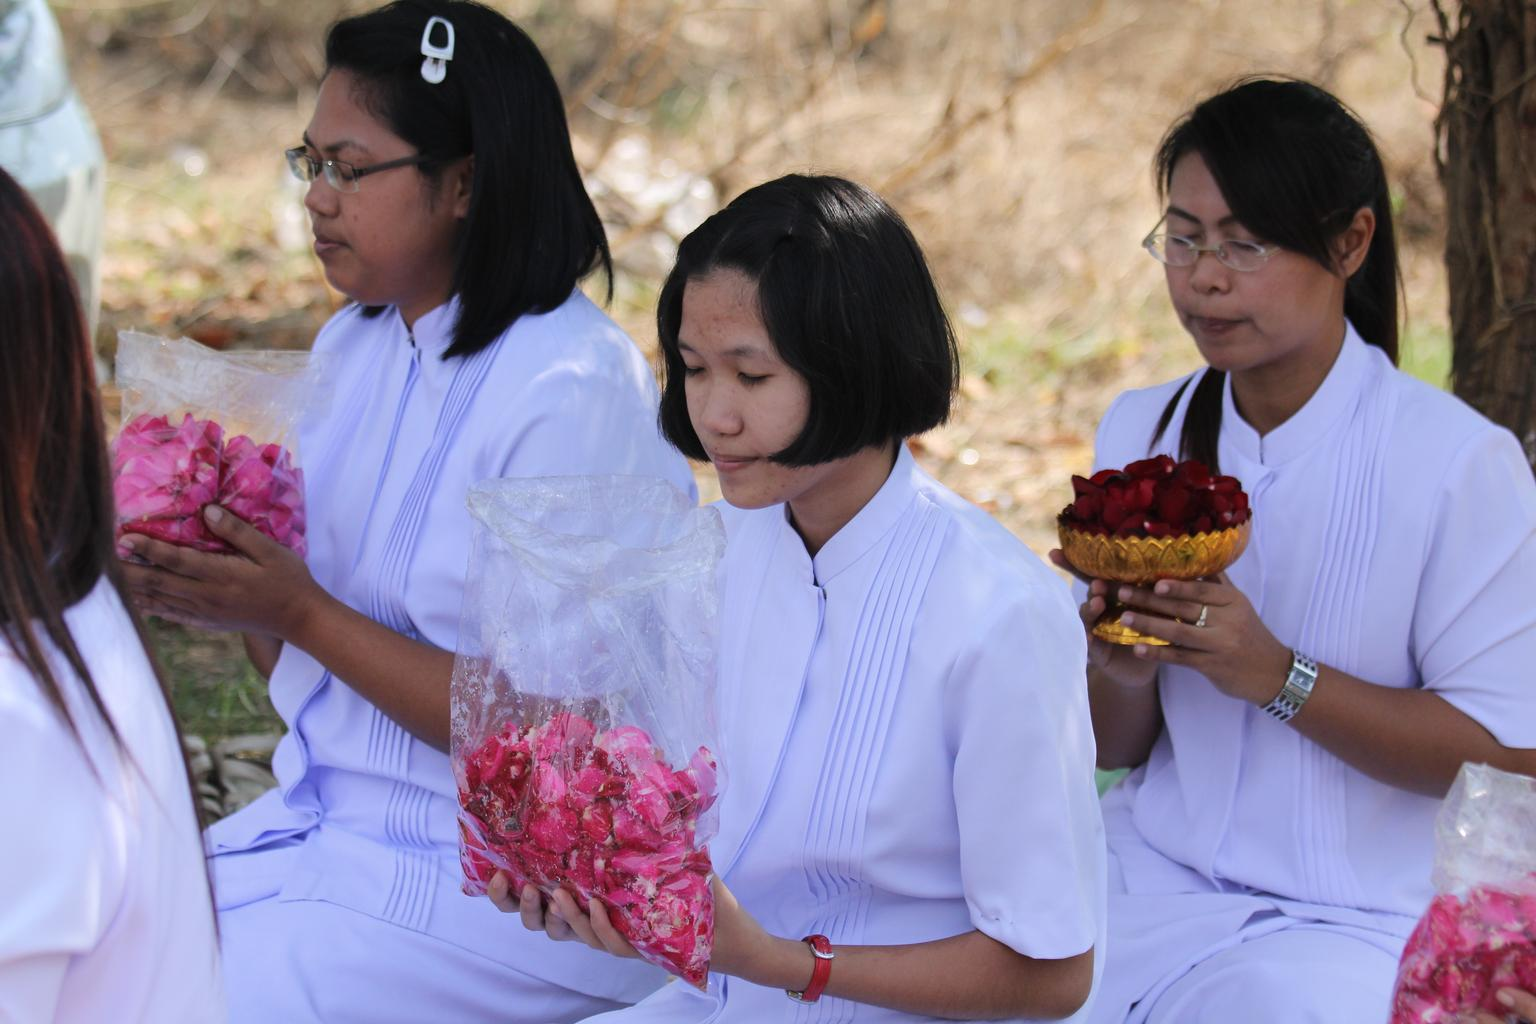 Vesak Celebrations in Chiang Rai – An Important Public Holiday in Thailand